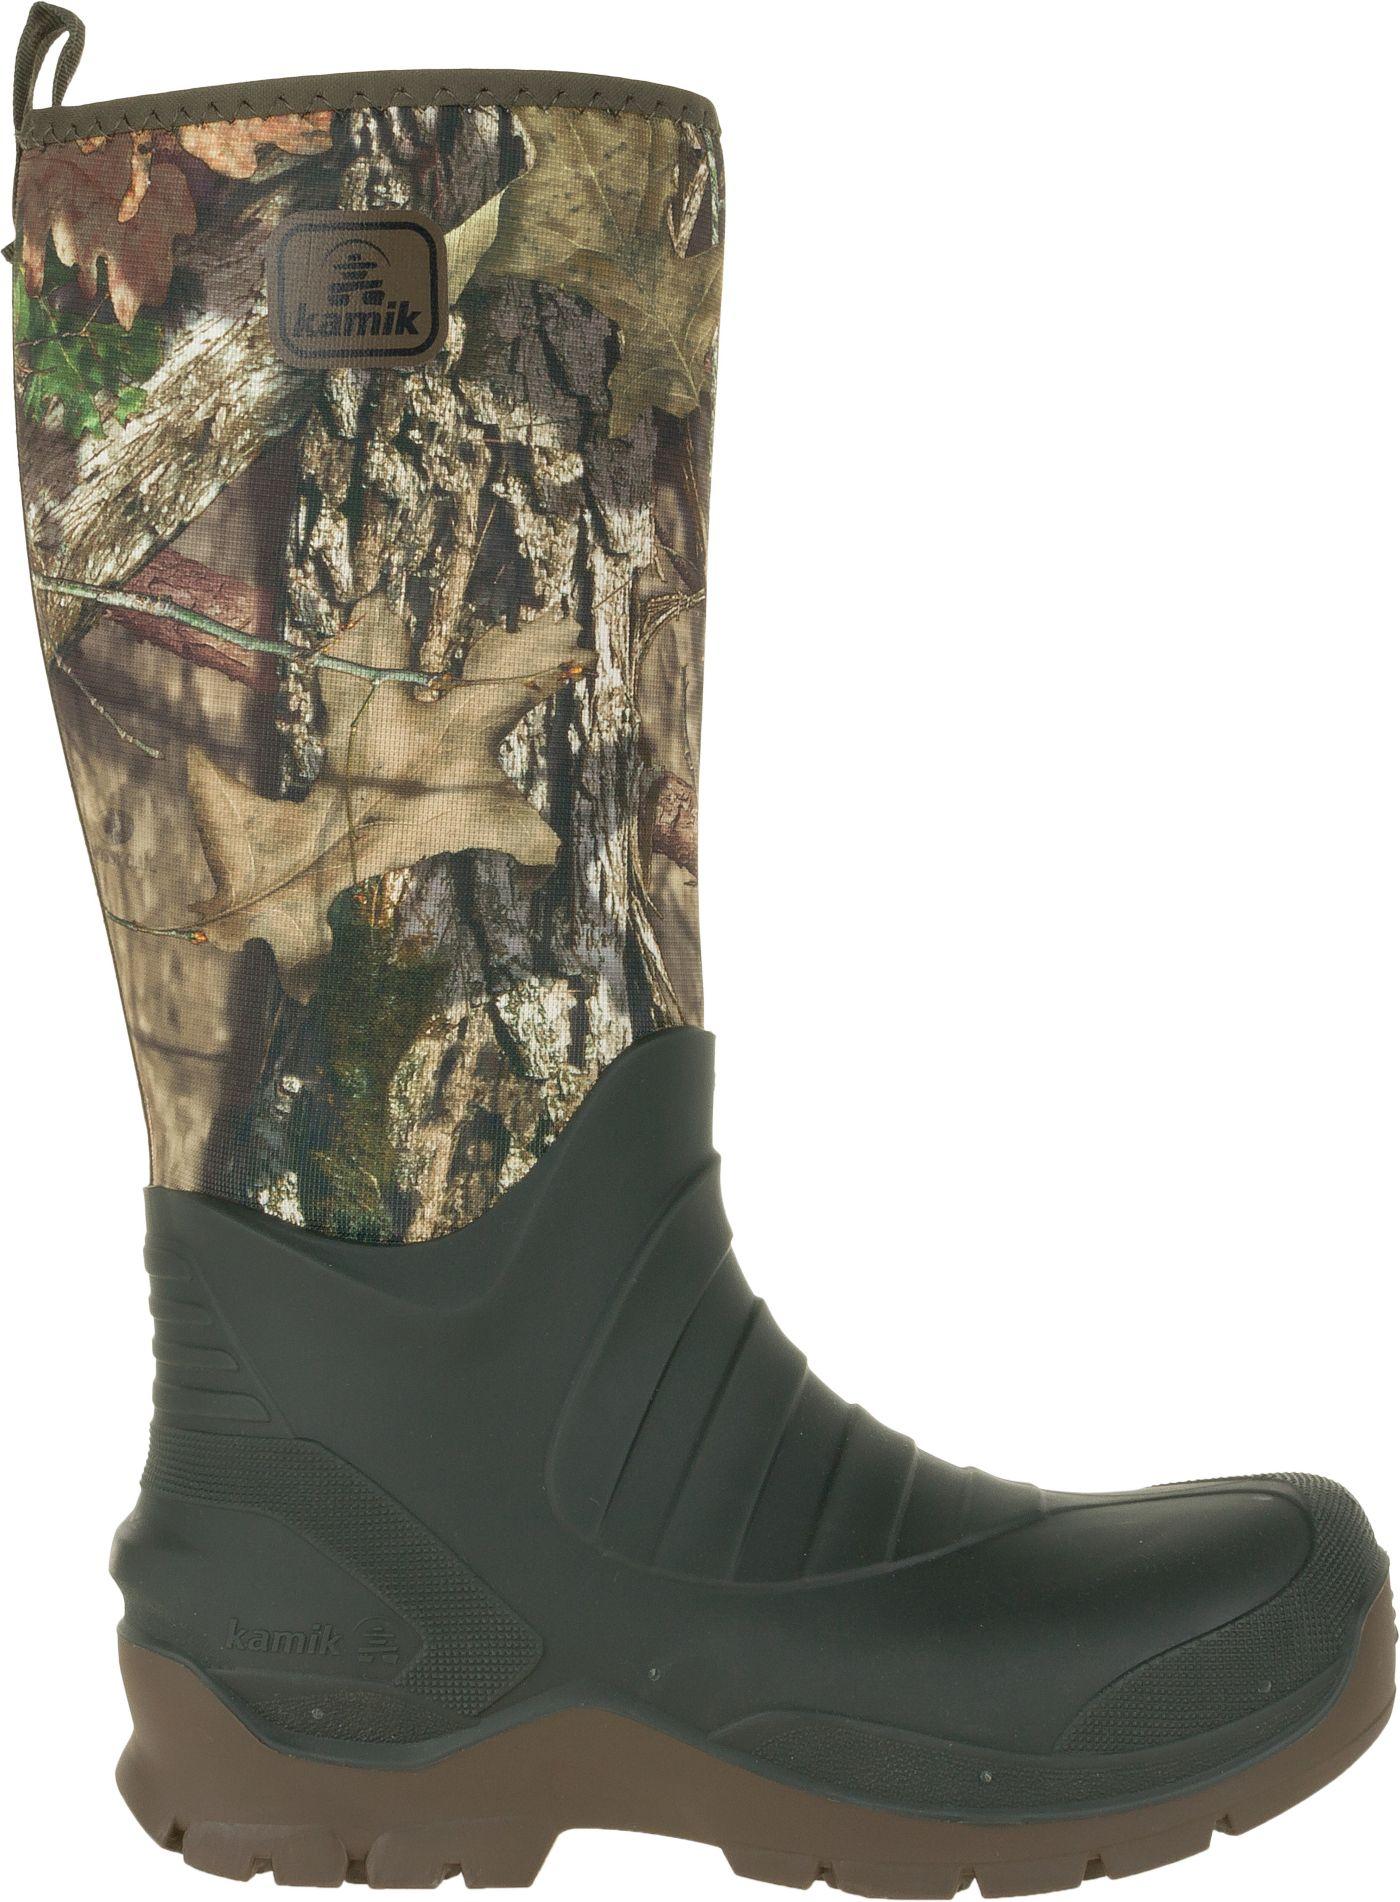 Kamik Men's Bushman V Mossy Oak Rubber Hunting Boots